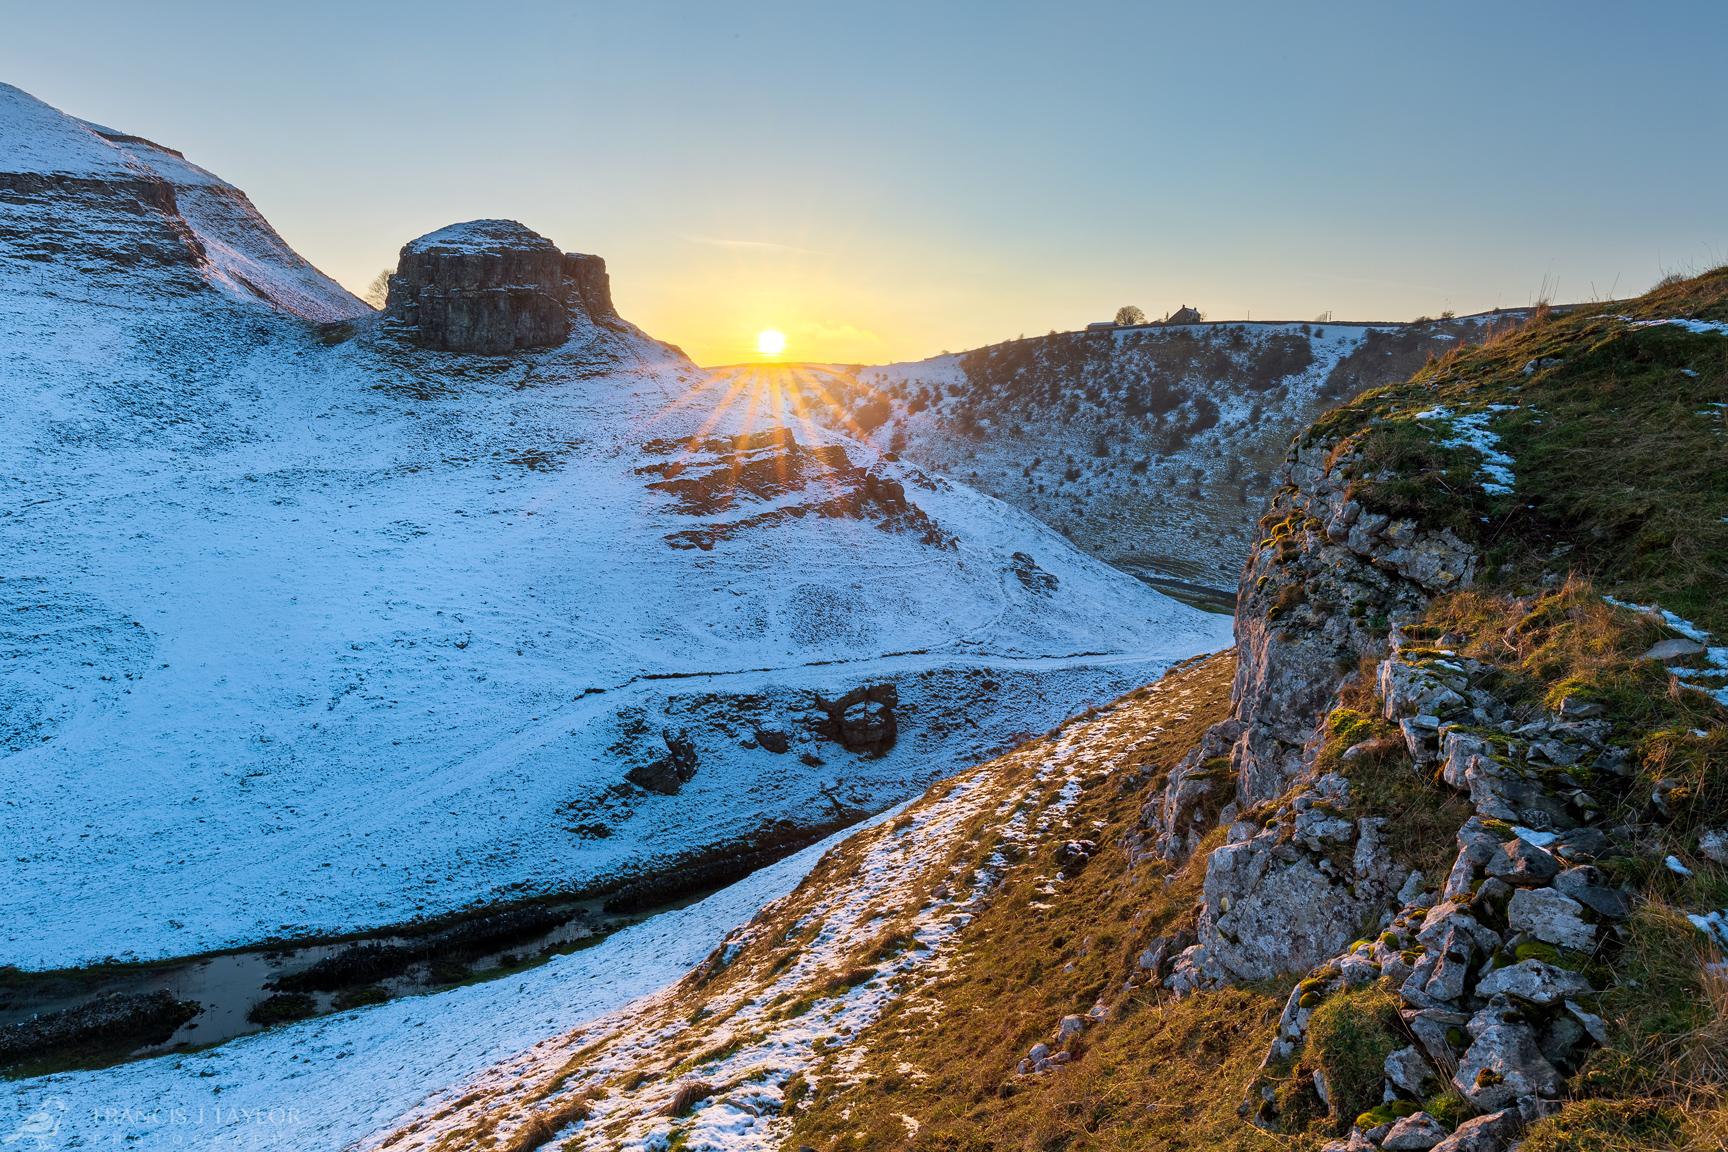 Peters-Stone-Sunset